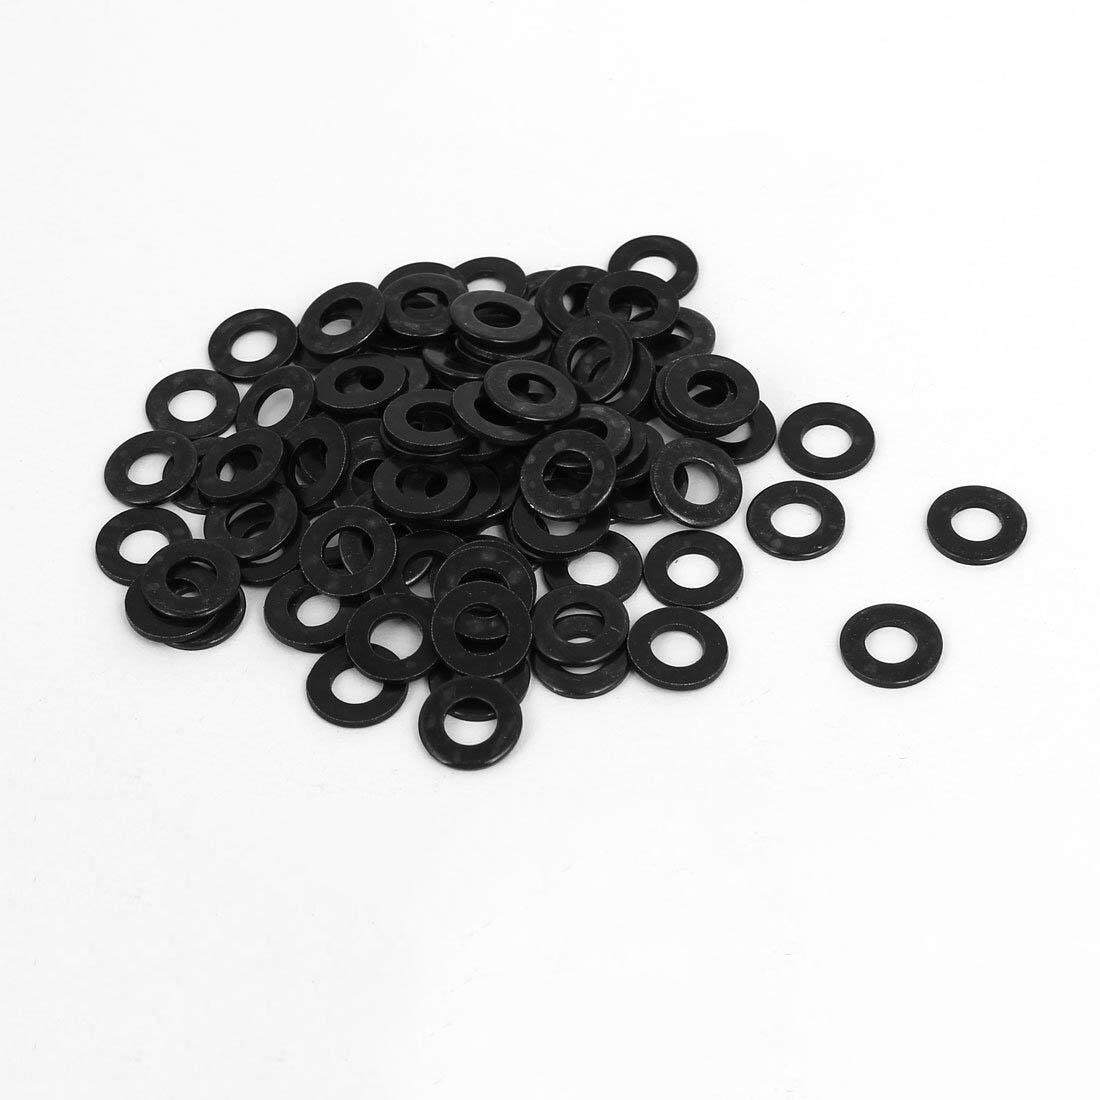 M5 x 10mm x 1mm Black Nylon Flat Washers Gaskets Spacers 100PCS